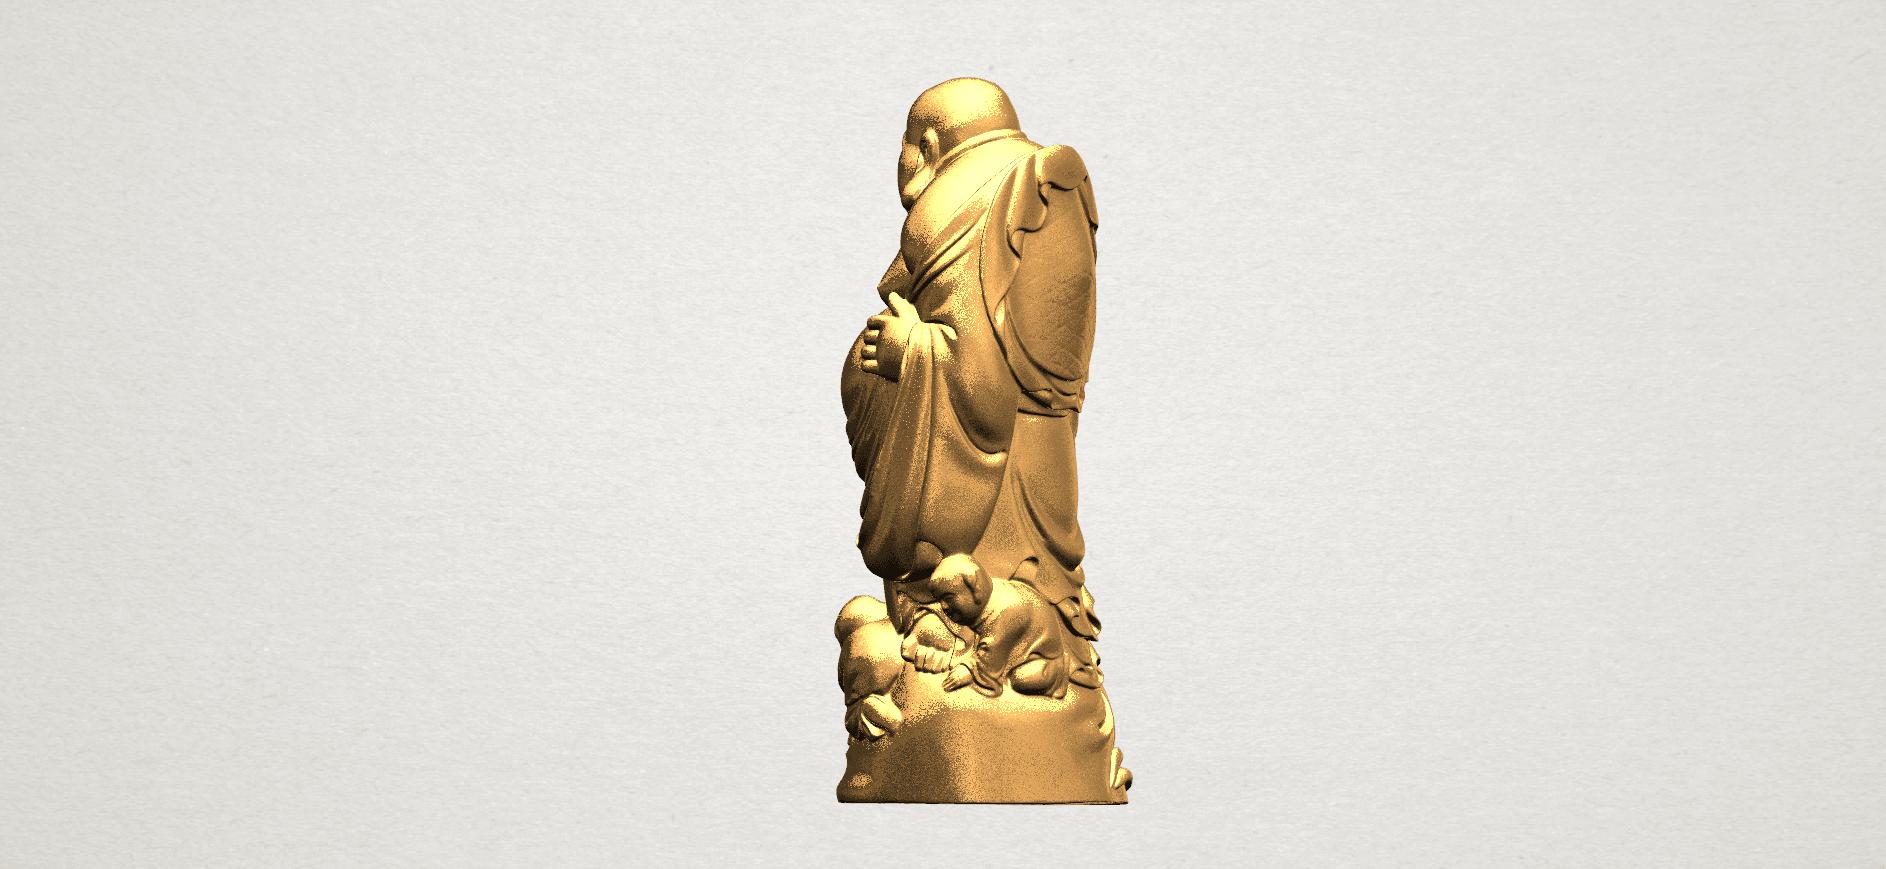 TDA0070 Metteyya Buddha 03 - 88mm - A04.png Download free STL file Metteyya Buddha 03 • 3D printing object, GeorgesNikkei